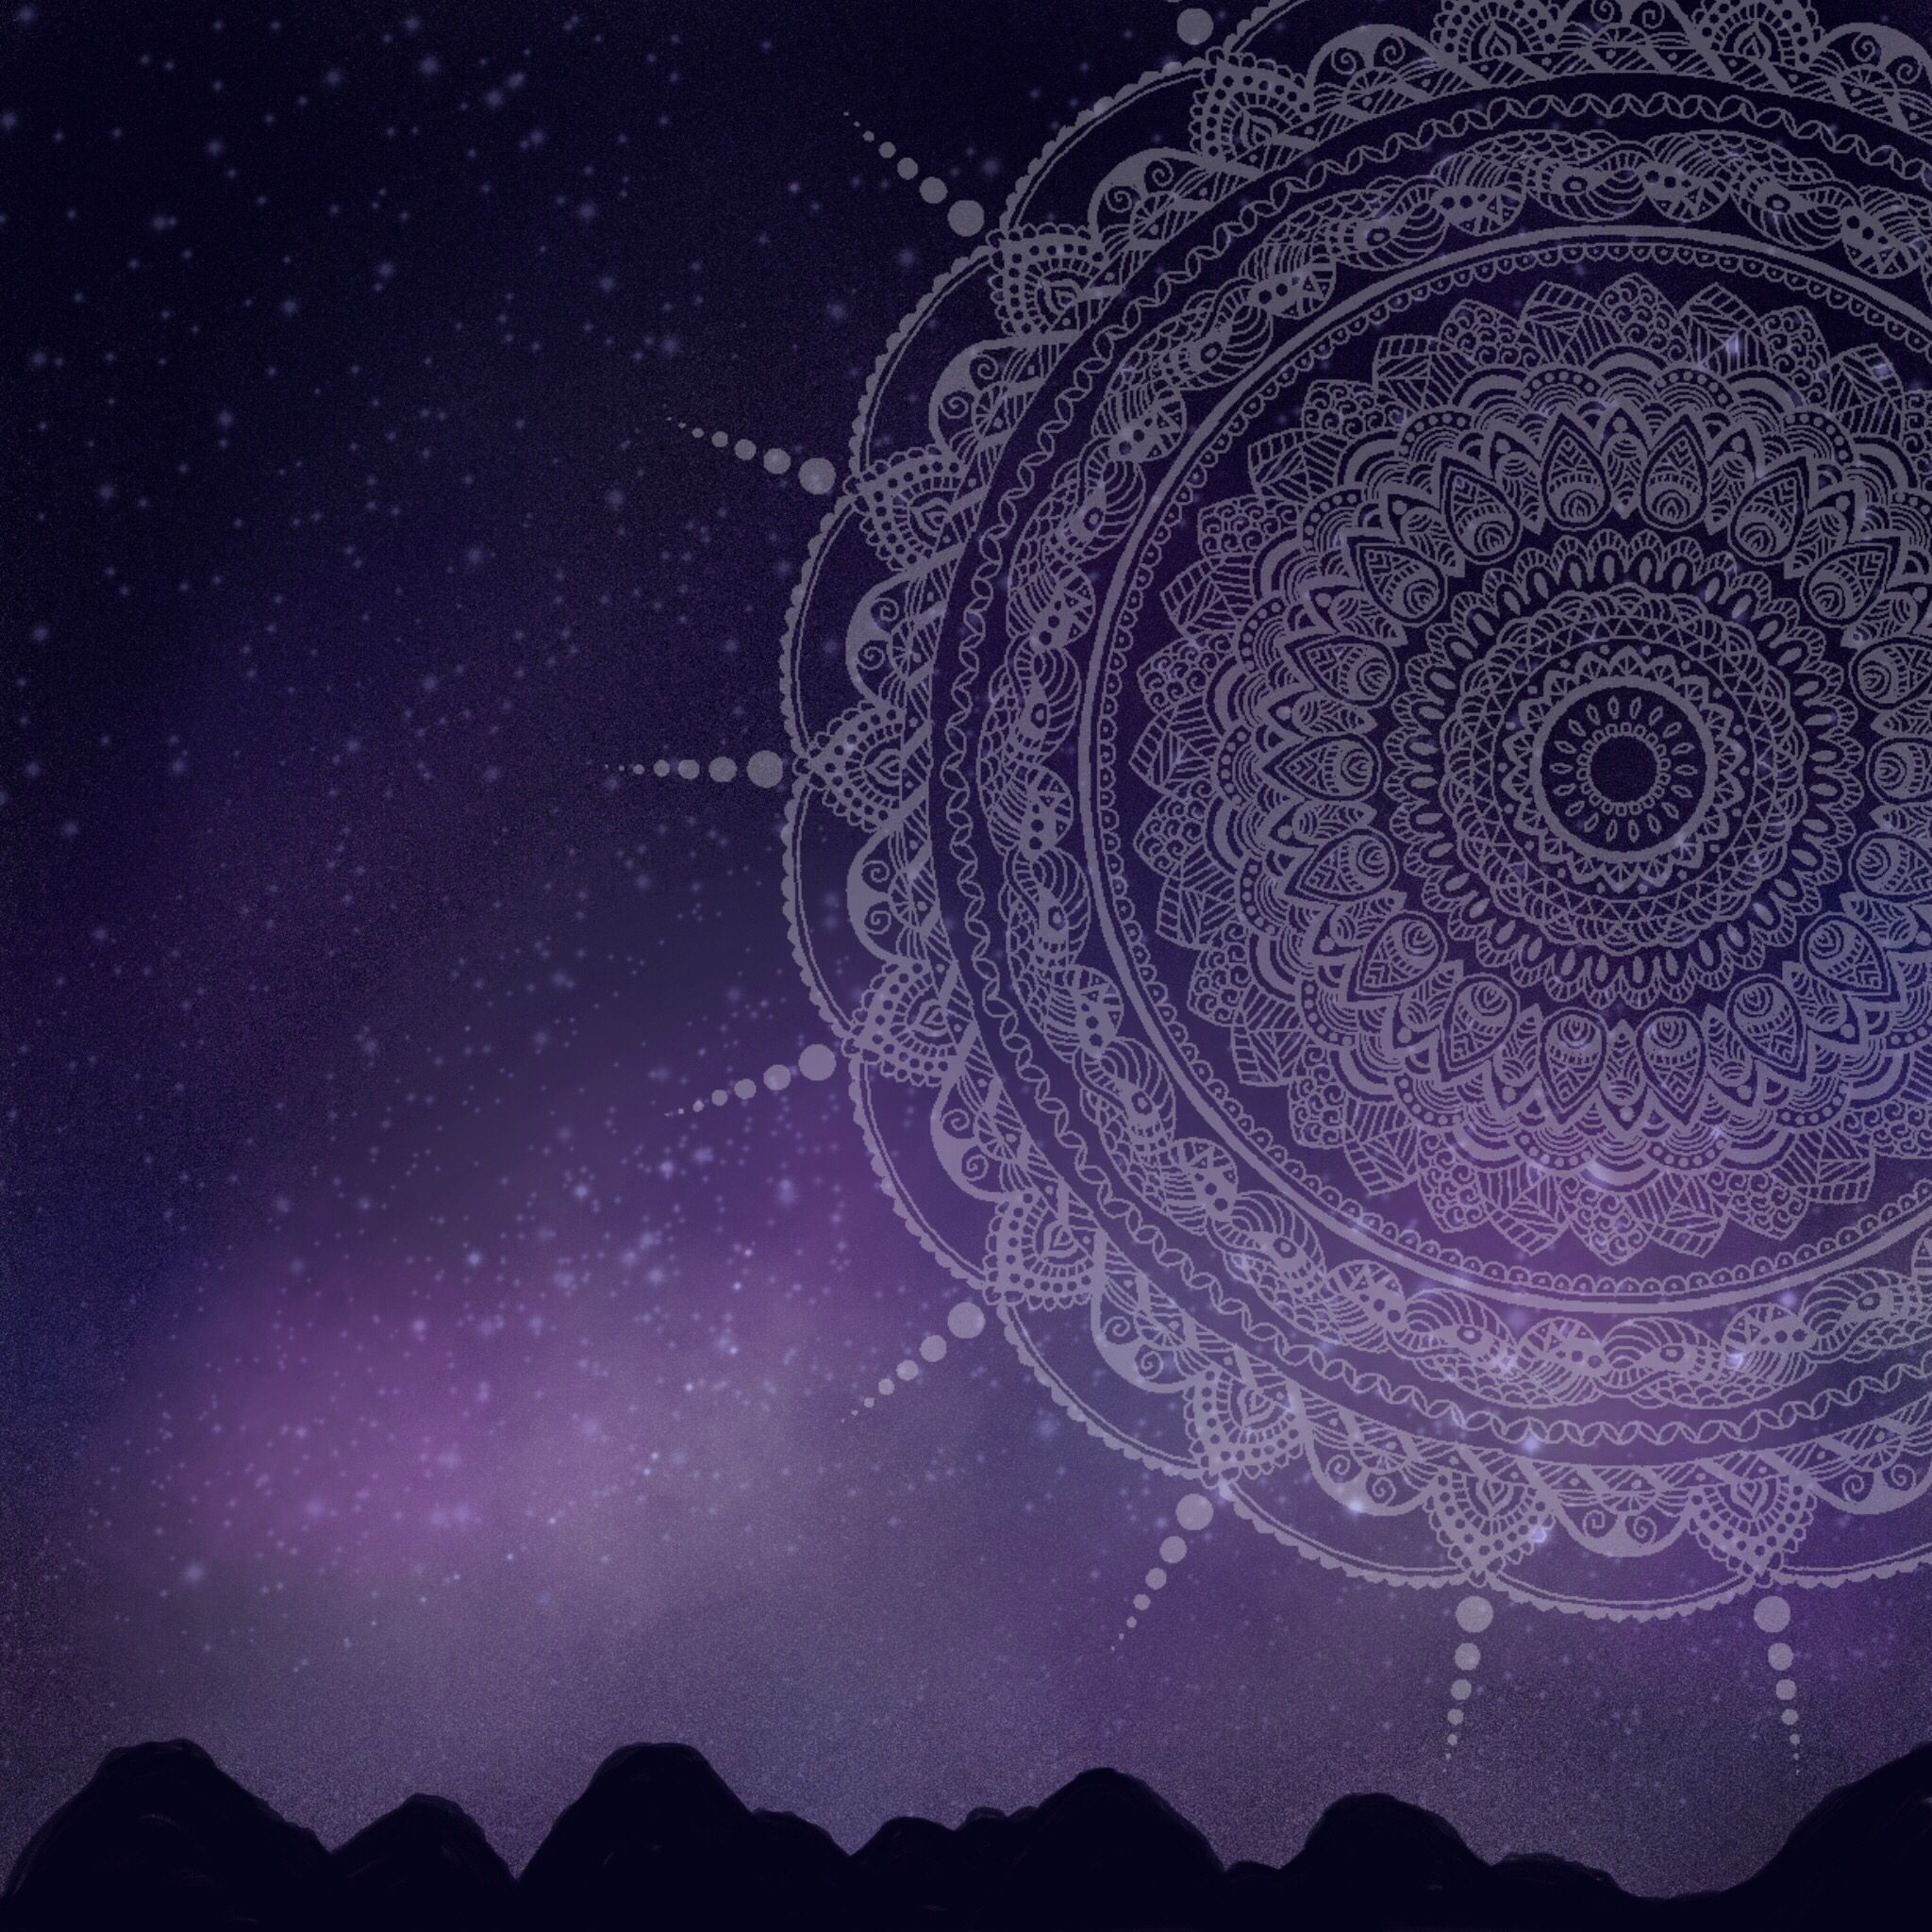 Mandala With Galaxy Background Drawn On Amaziograph App Galaxy Background Background Drawing Digital Drawing